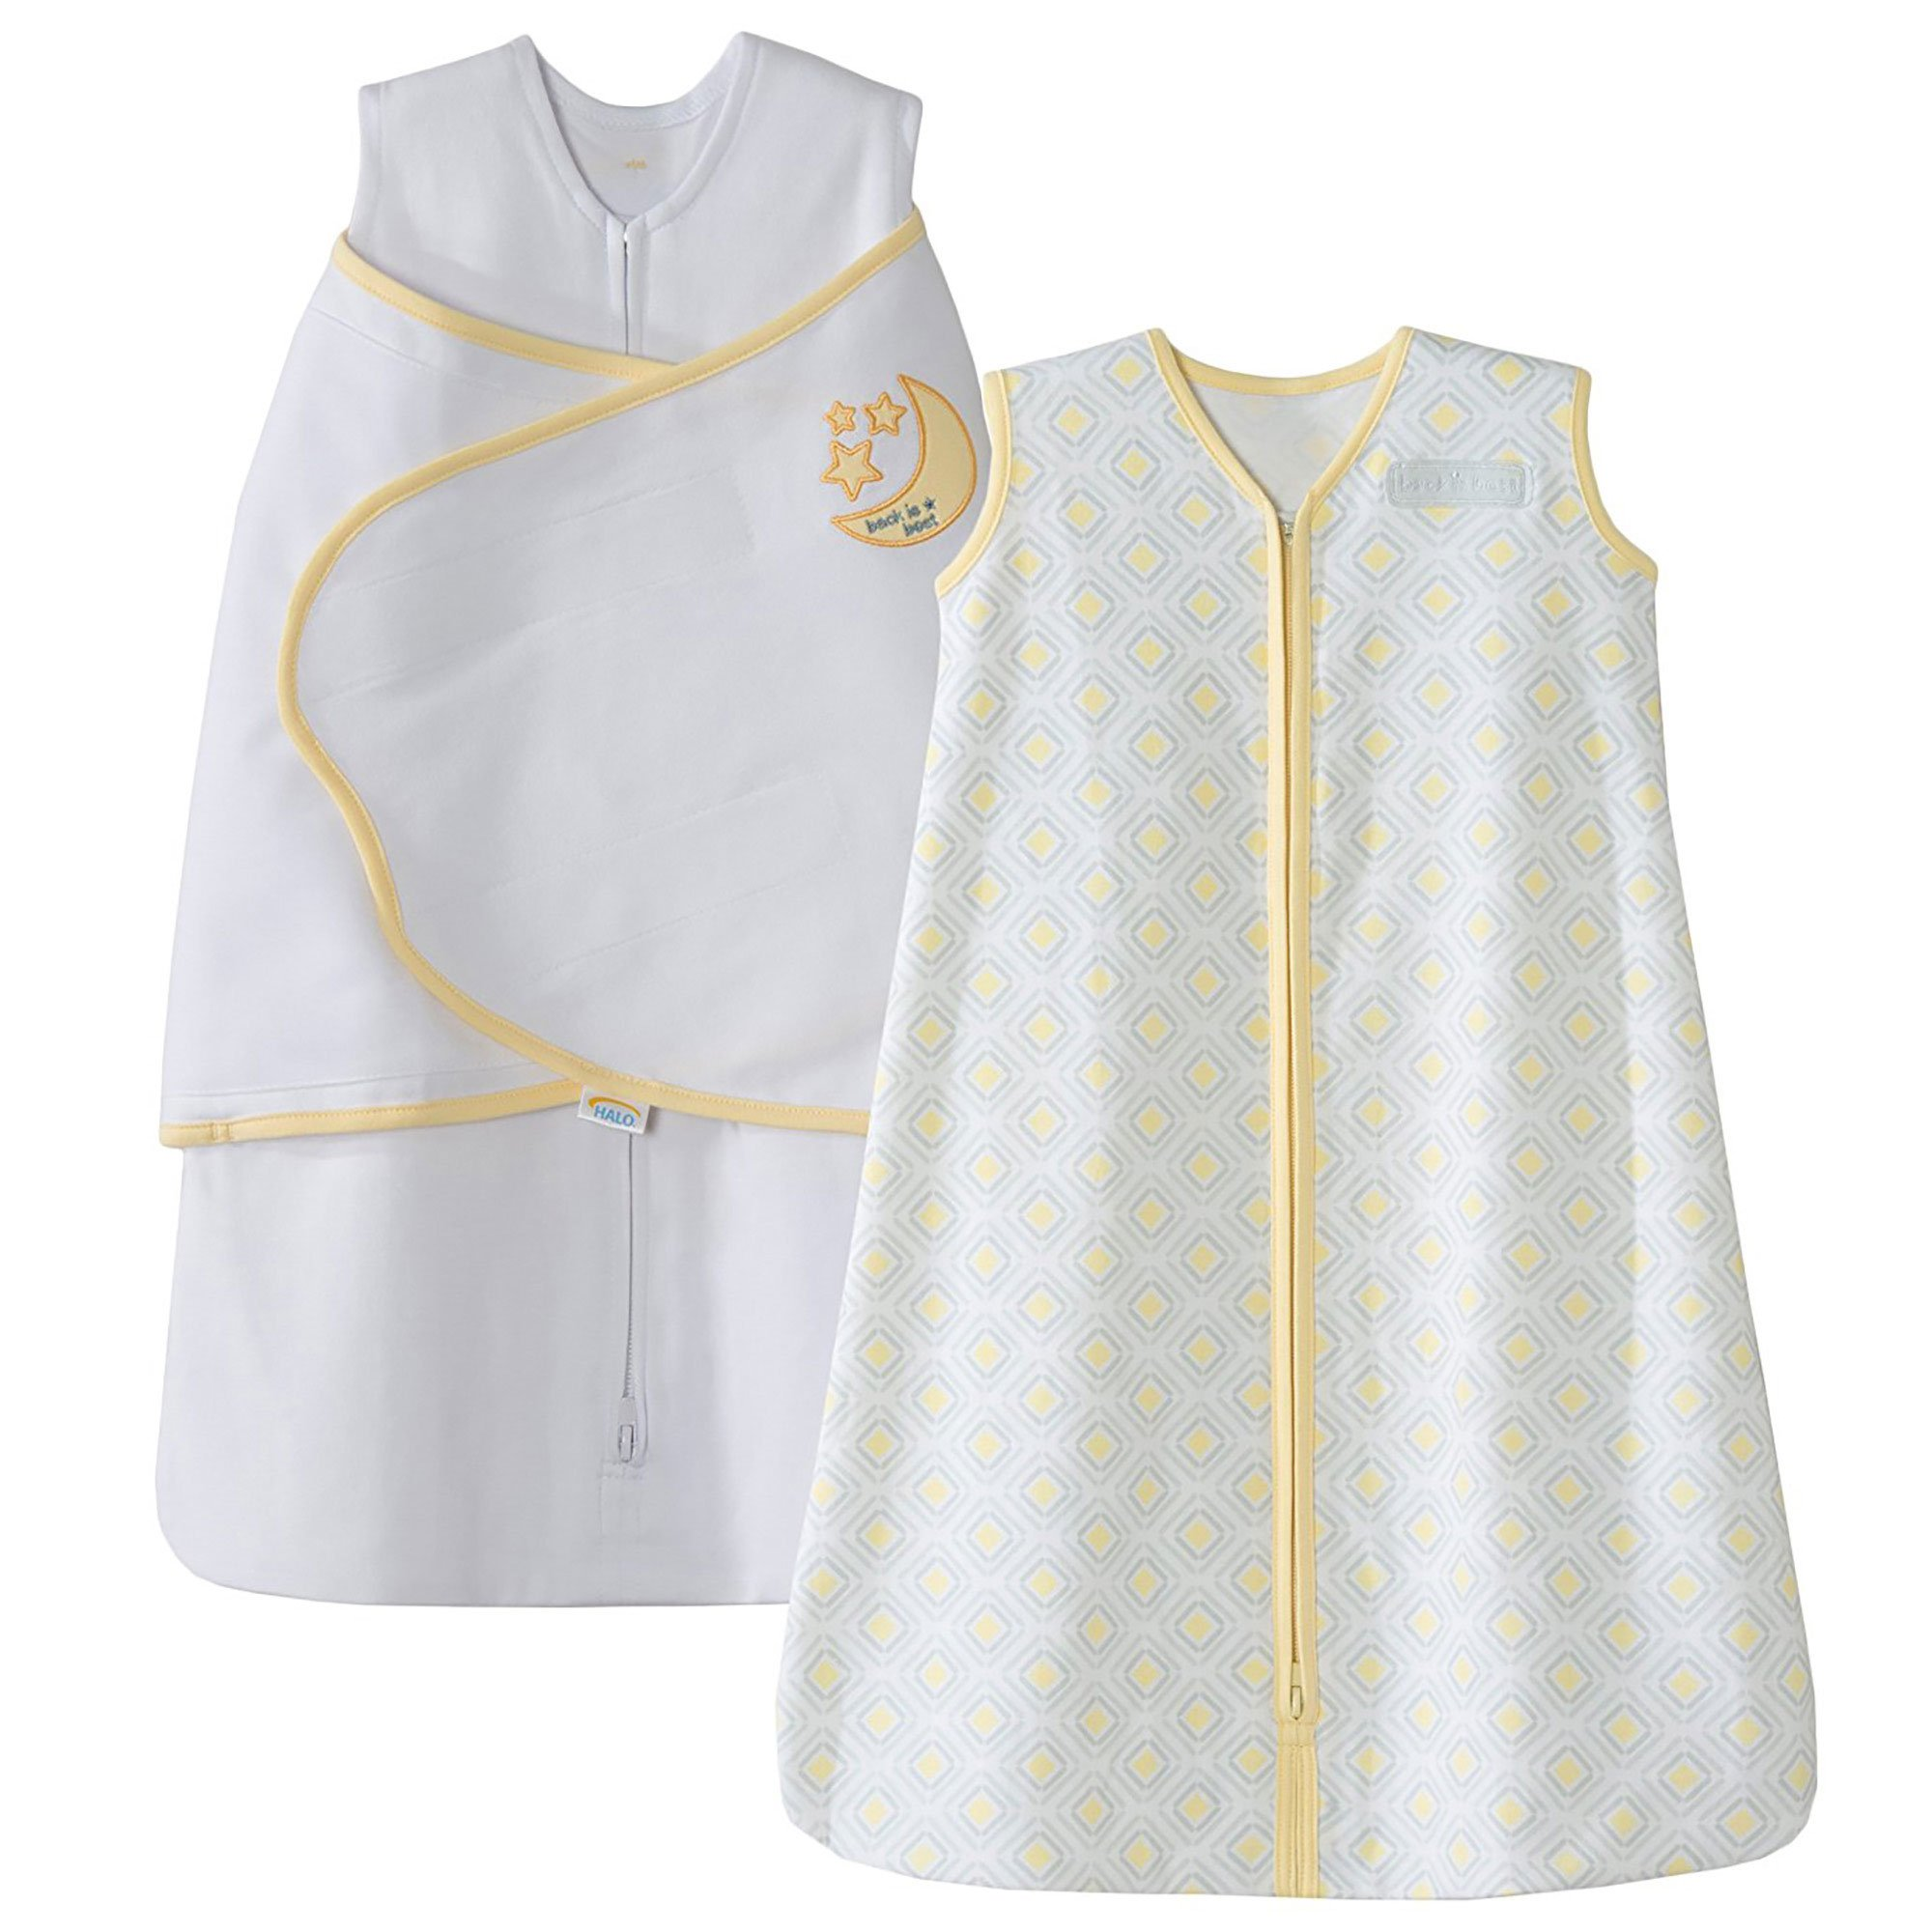 HALO SleepSack 100% Cotton Swaddle and Wearable Blanket Gift Set, White/Gray/Yellow Diamond, 2 Piece